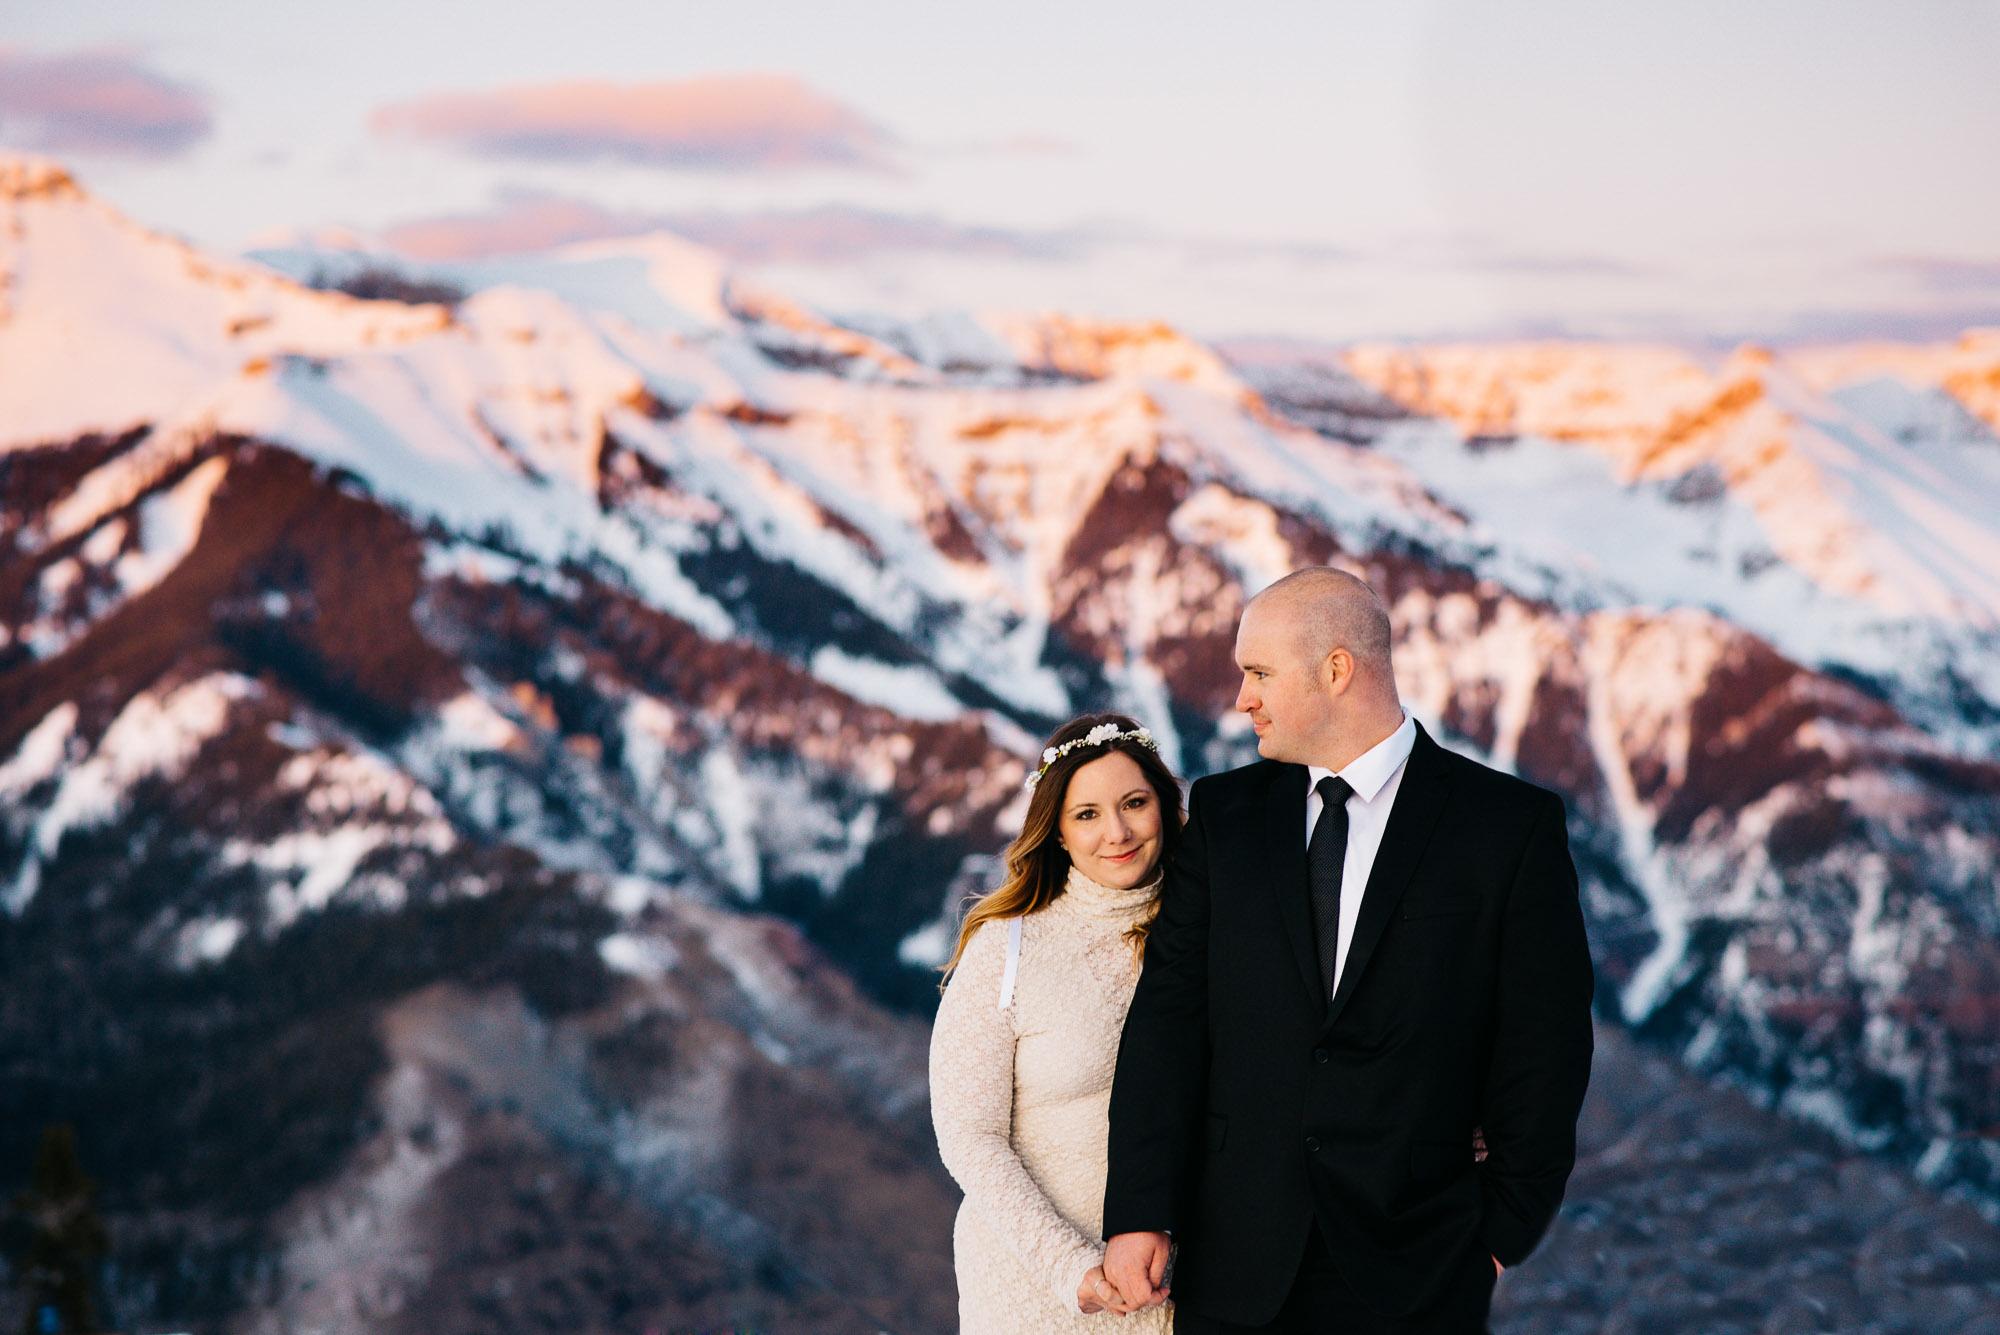 32elopement-photographer-colorado-telluride-winter-wedding-mountain-wedding-photographer-paige&chad-1037-2.jpg